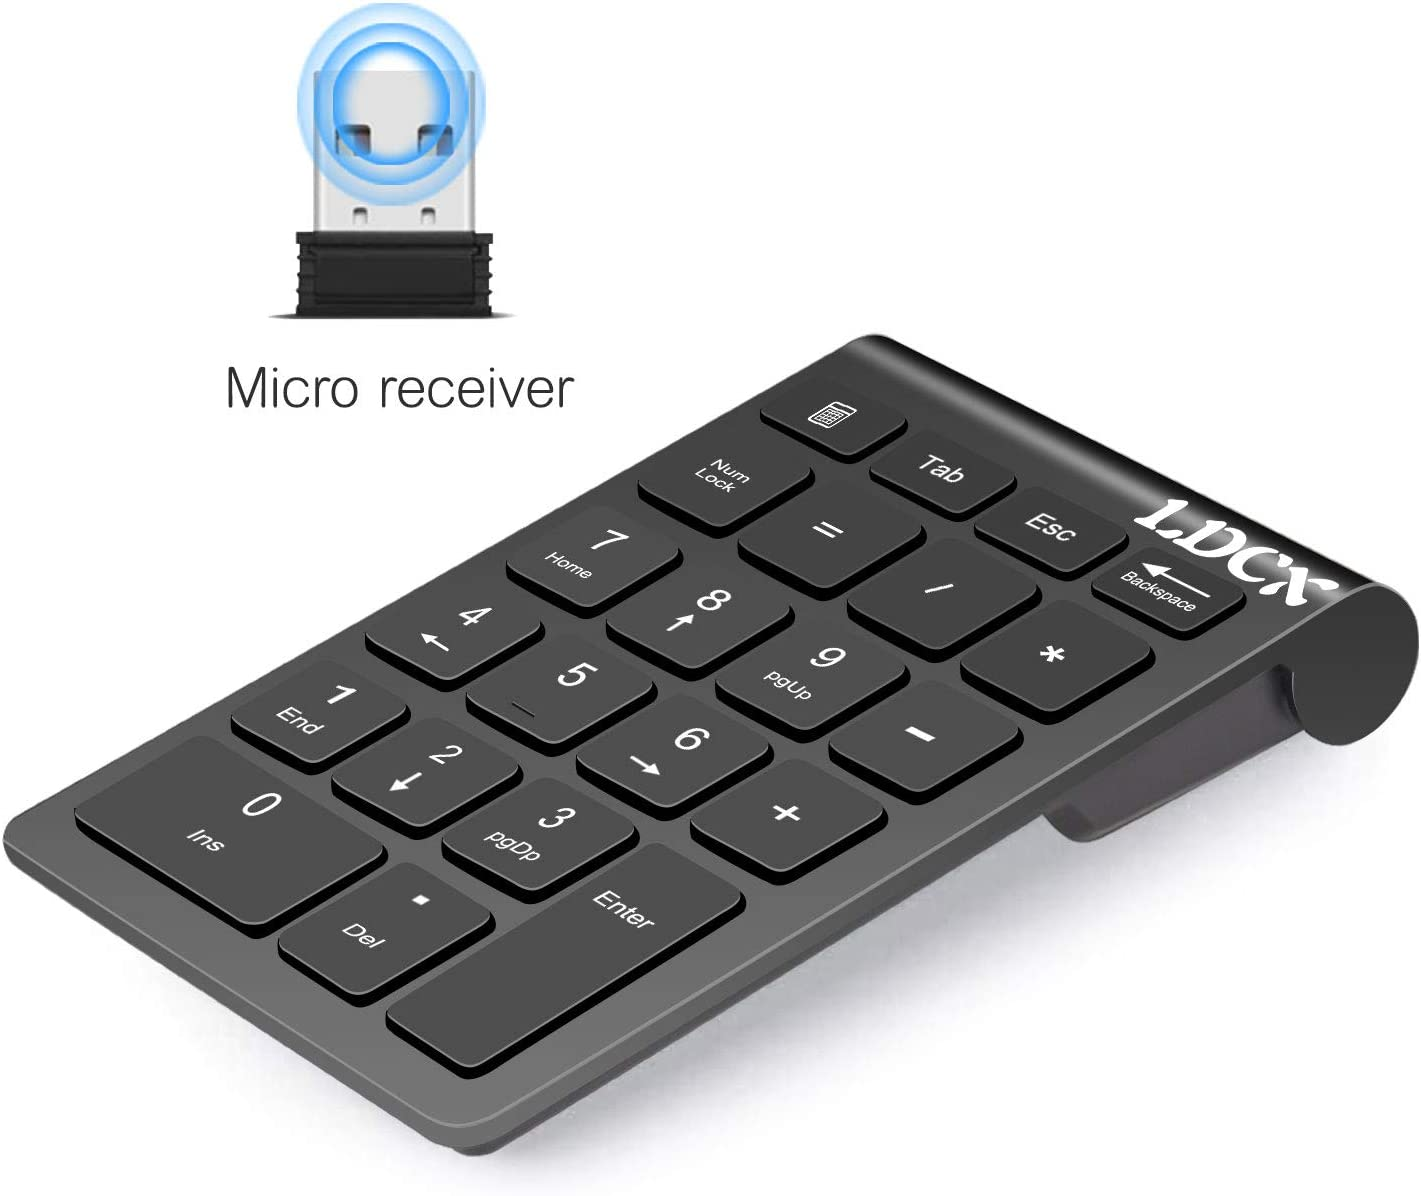 USB Numeric Keypad, Mini Number Keypad for Laptop Desktop Computer PC, Wireless 22 Keys Slim USB Number Pad, Portable Numeric Keypad 2.4GHz -Black